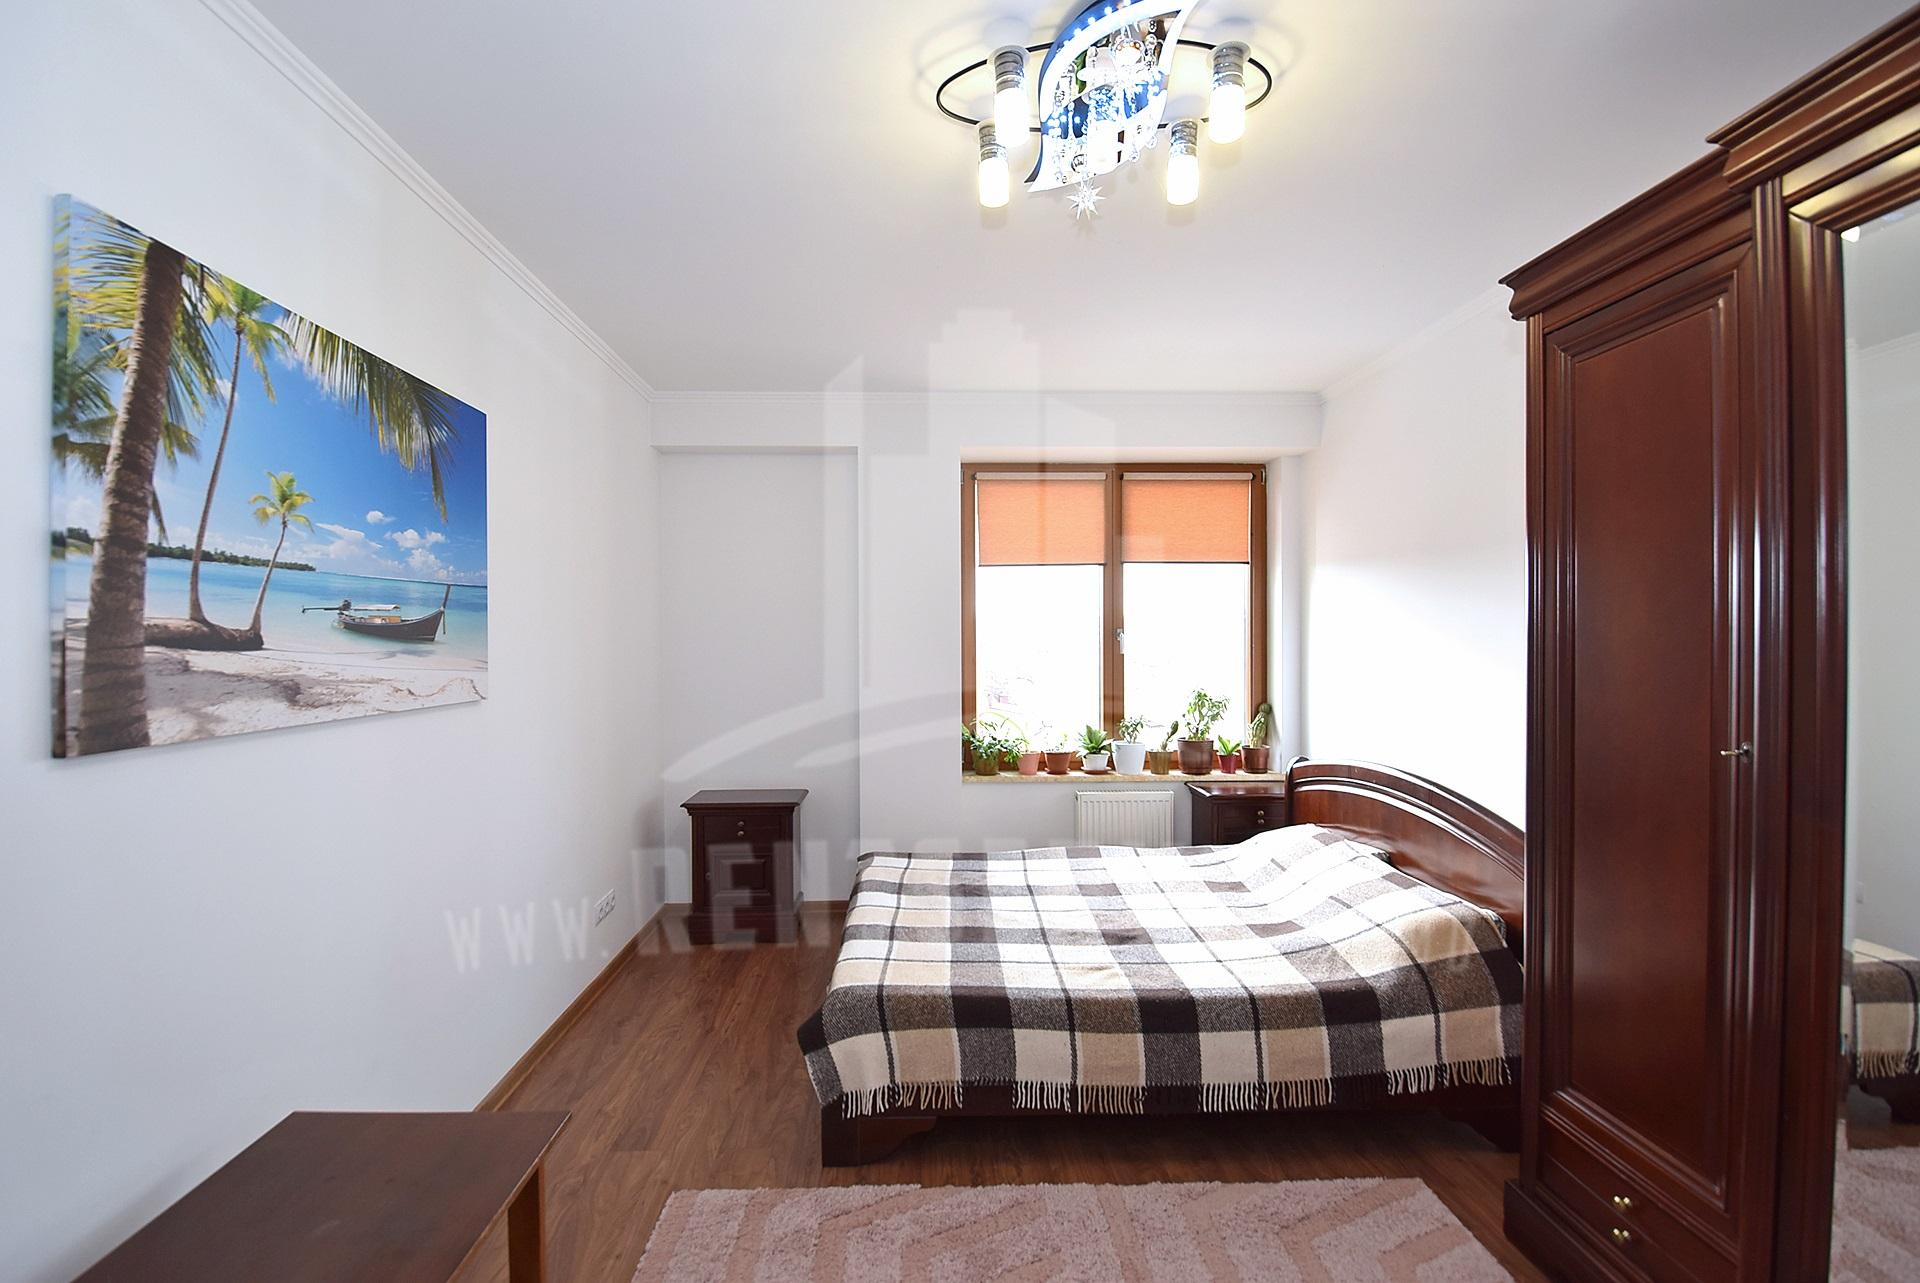 287_apartment_12.JPG